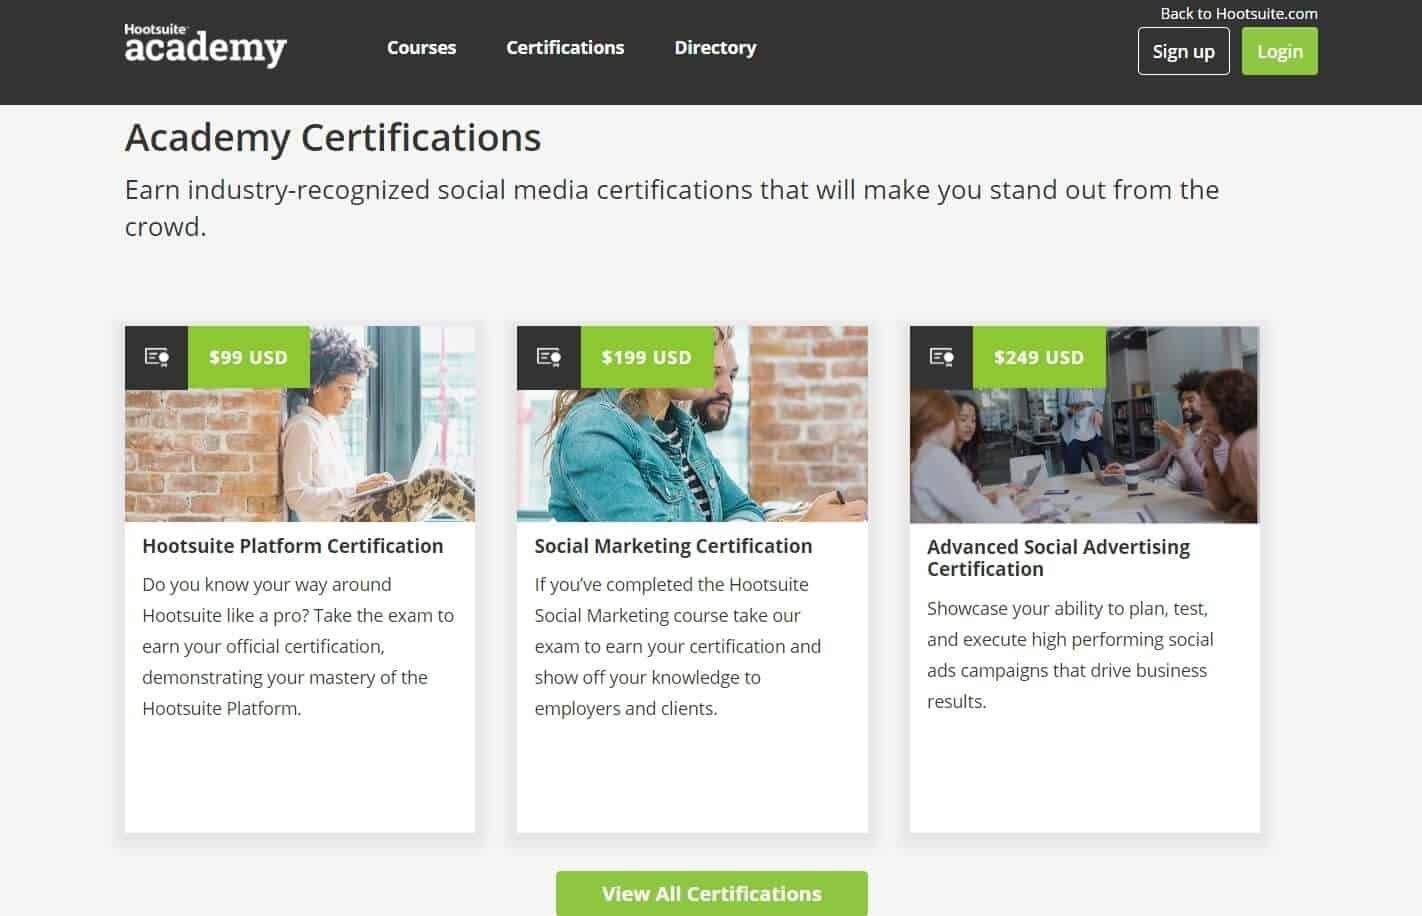 Le certificazioni avanzate di hootsuite